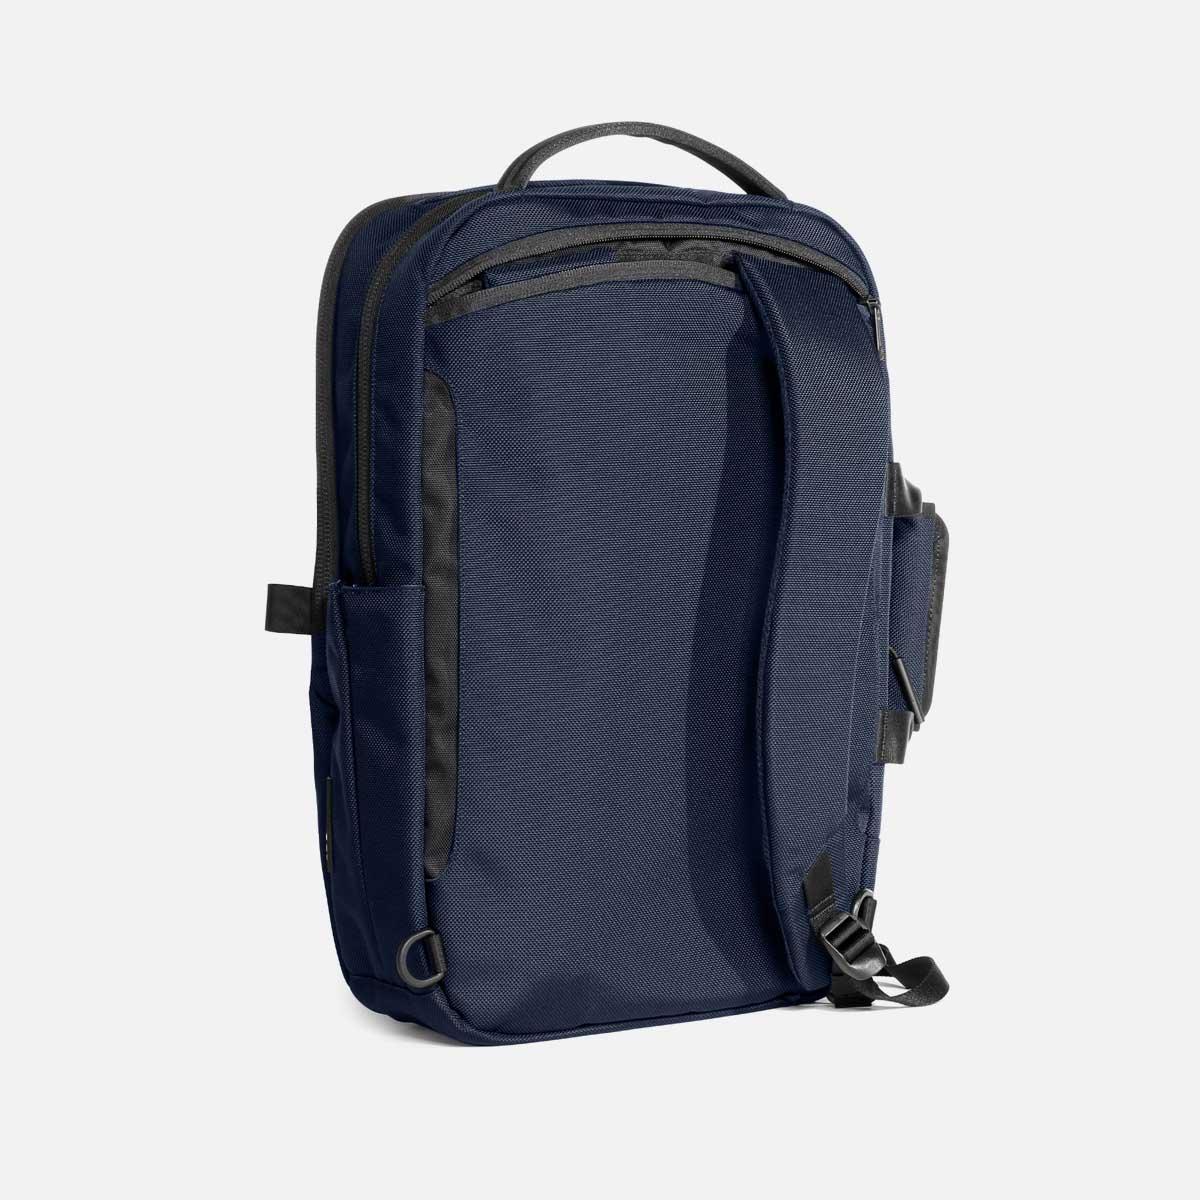 23010_flightpack2_navy_shoulderstrap.jpg